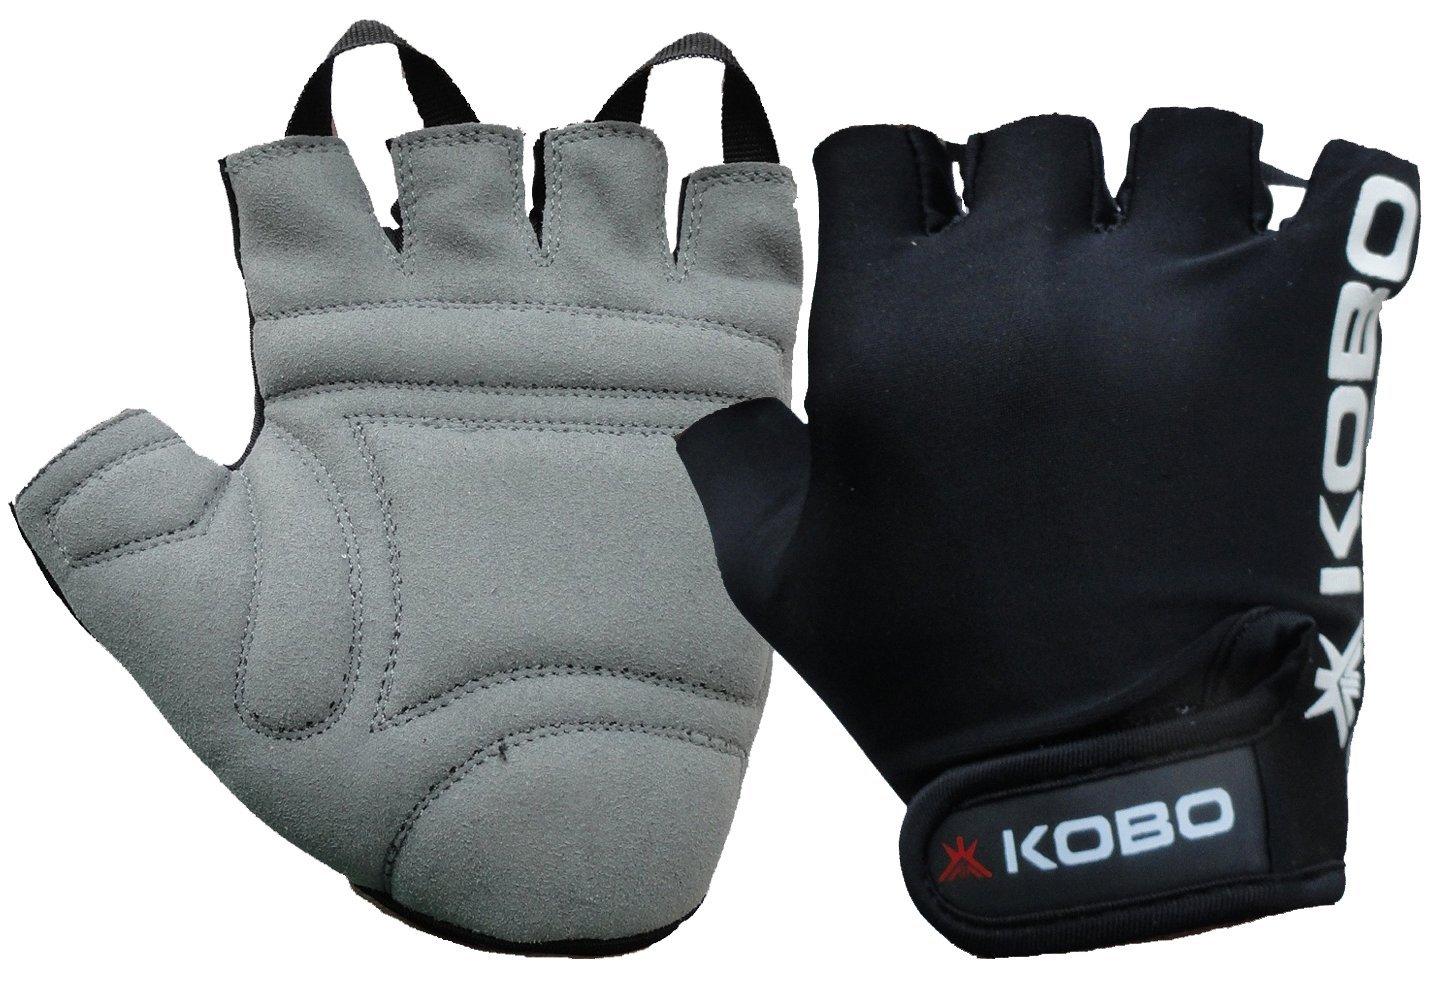 Mens leather gloves online india - Kobo Fitness Gloves Weight Lifting Gloves Gym Gloves Bike Gloves Imported